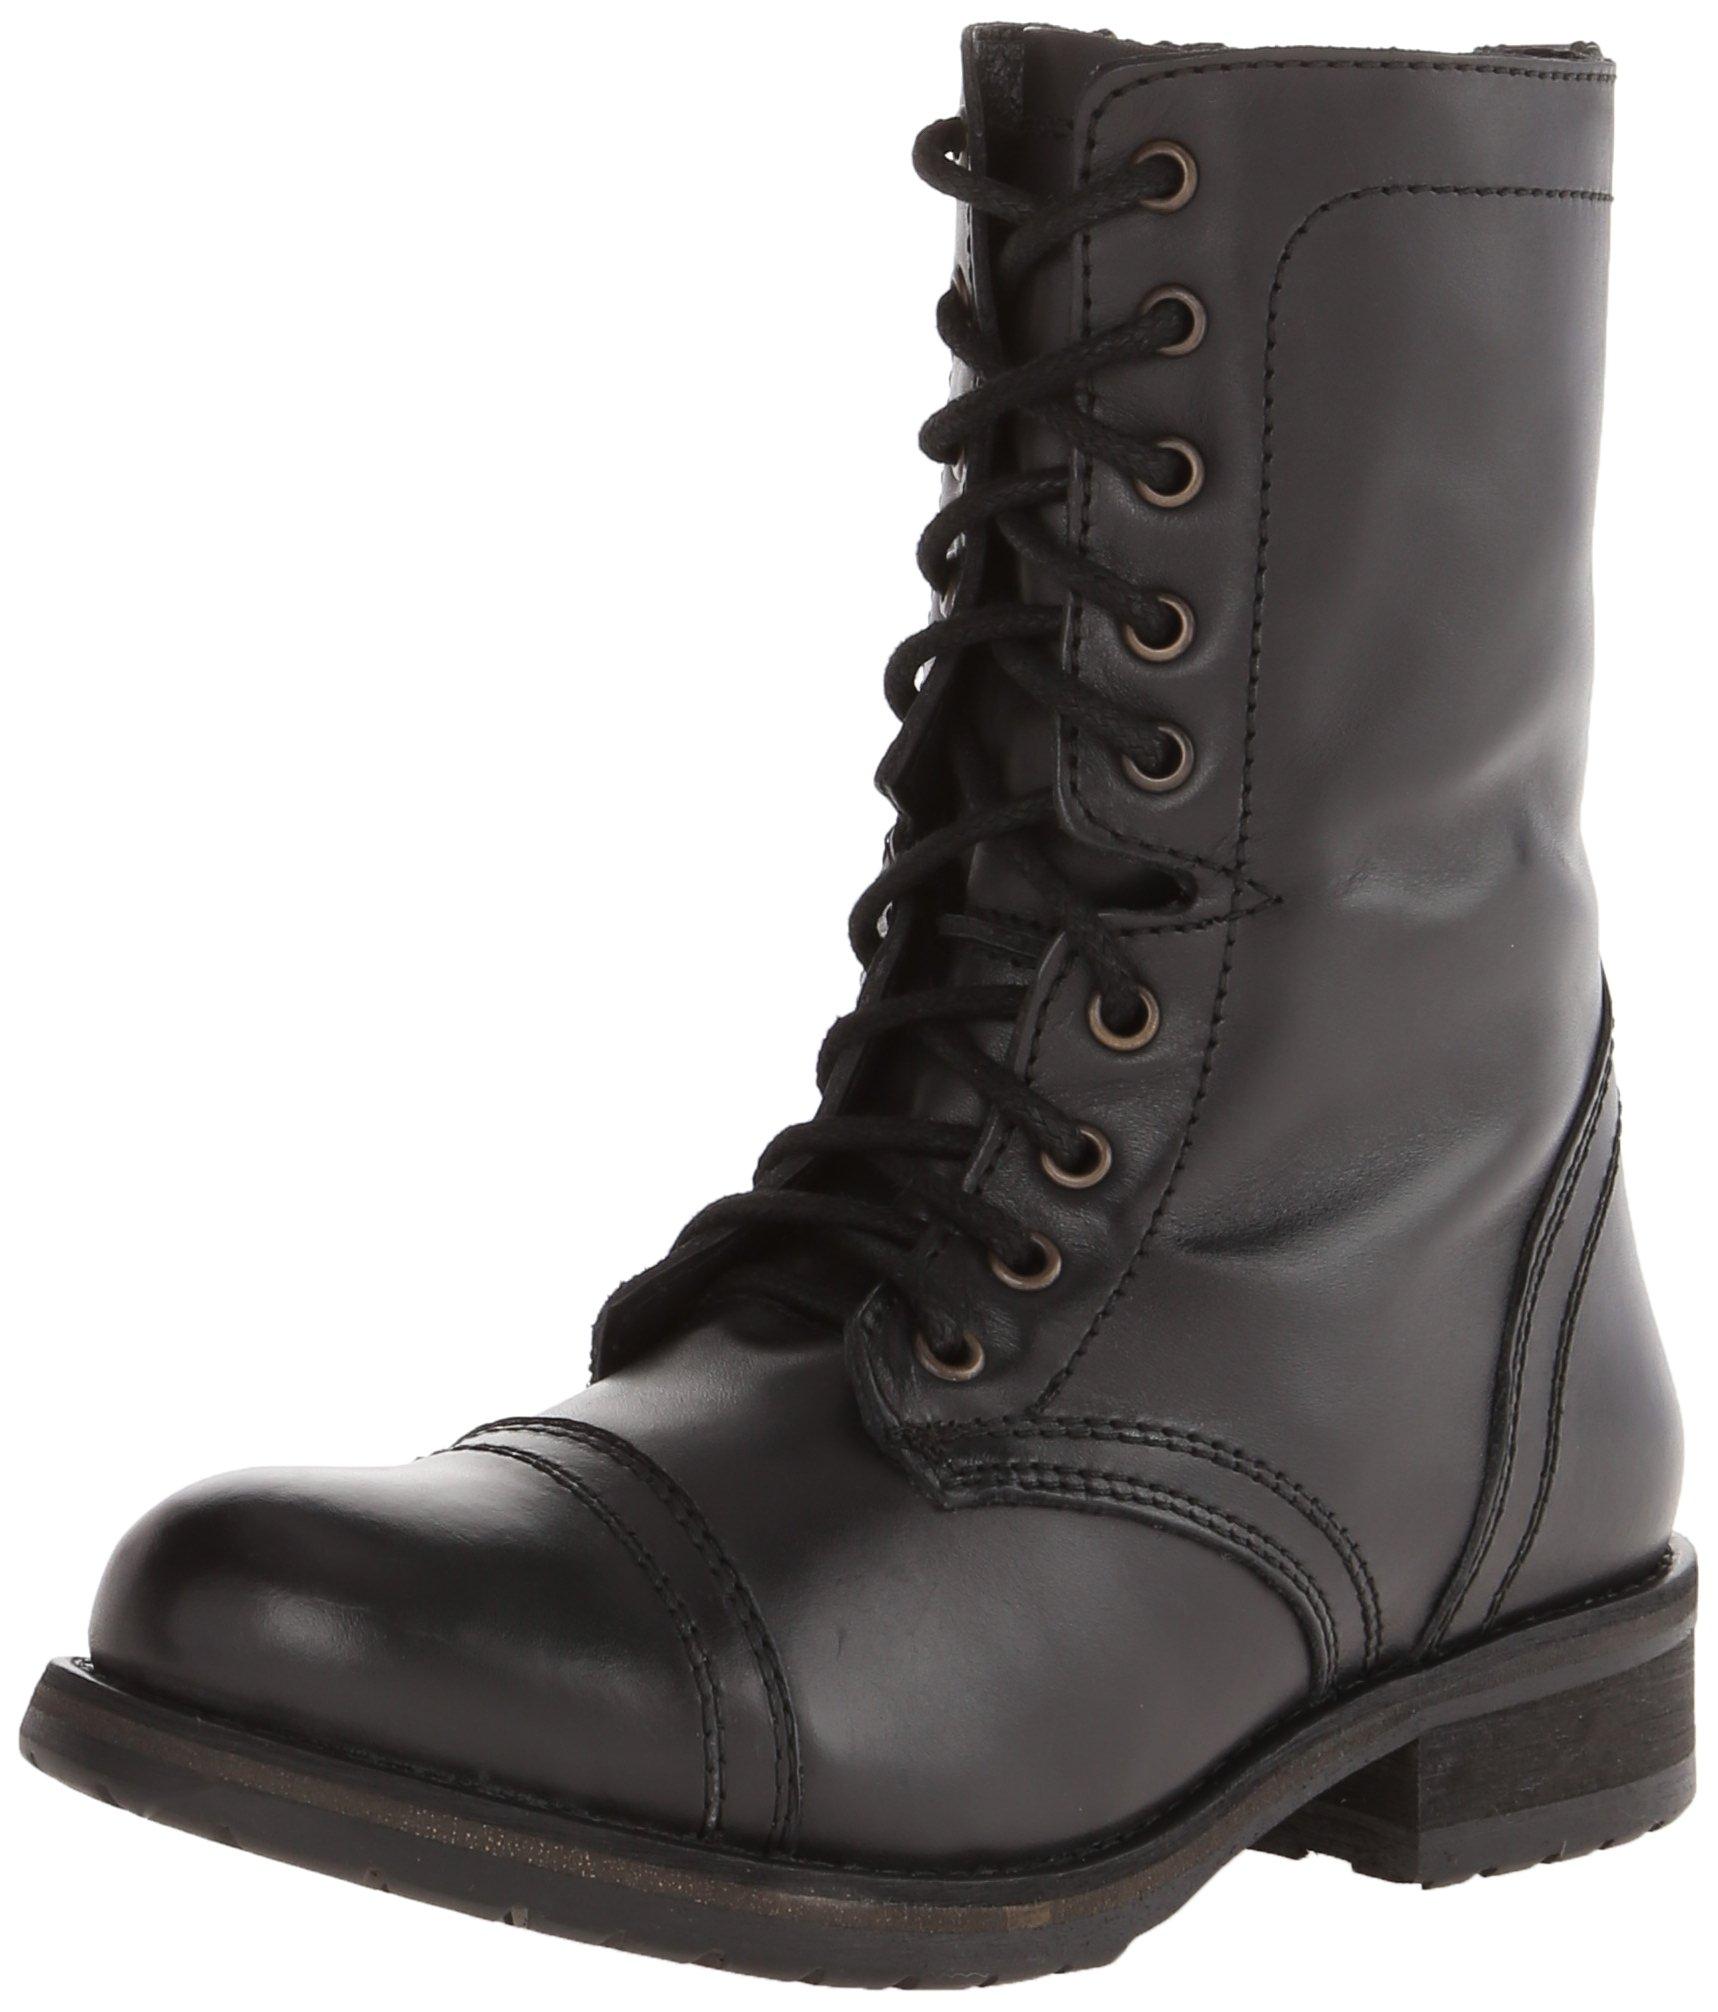 Steve Madden Women's Troopa 2.0 Combat Boot, Black Leather, 8 M US